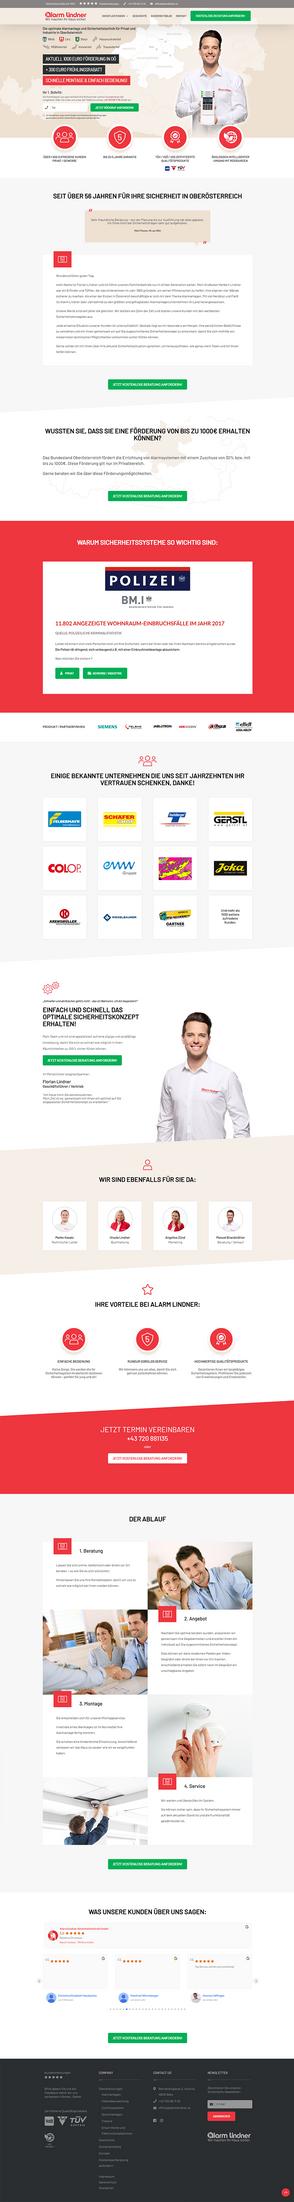 Alarm Lindner GmbH